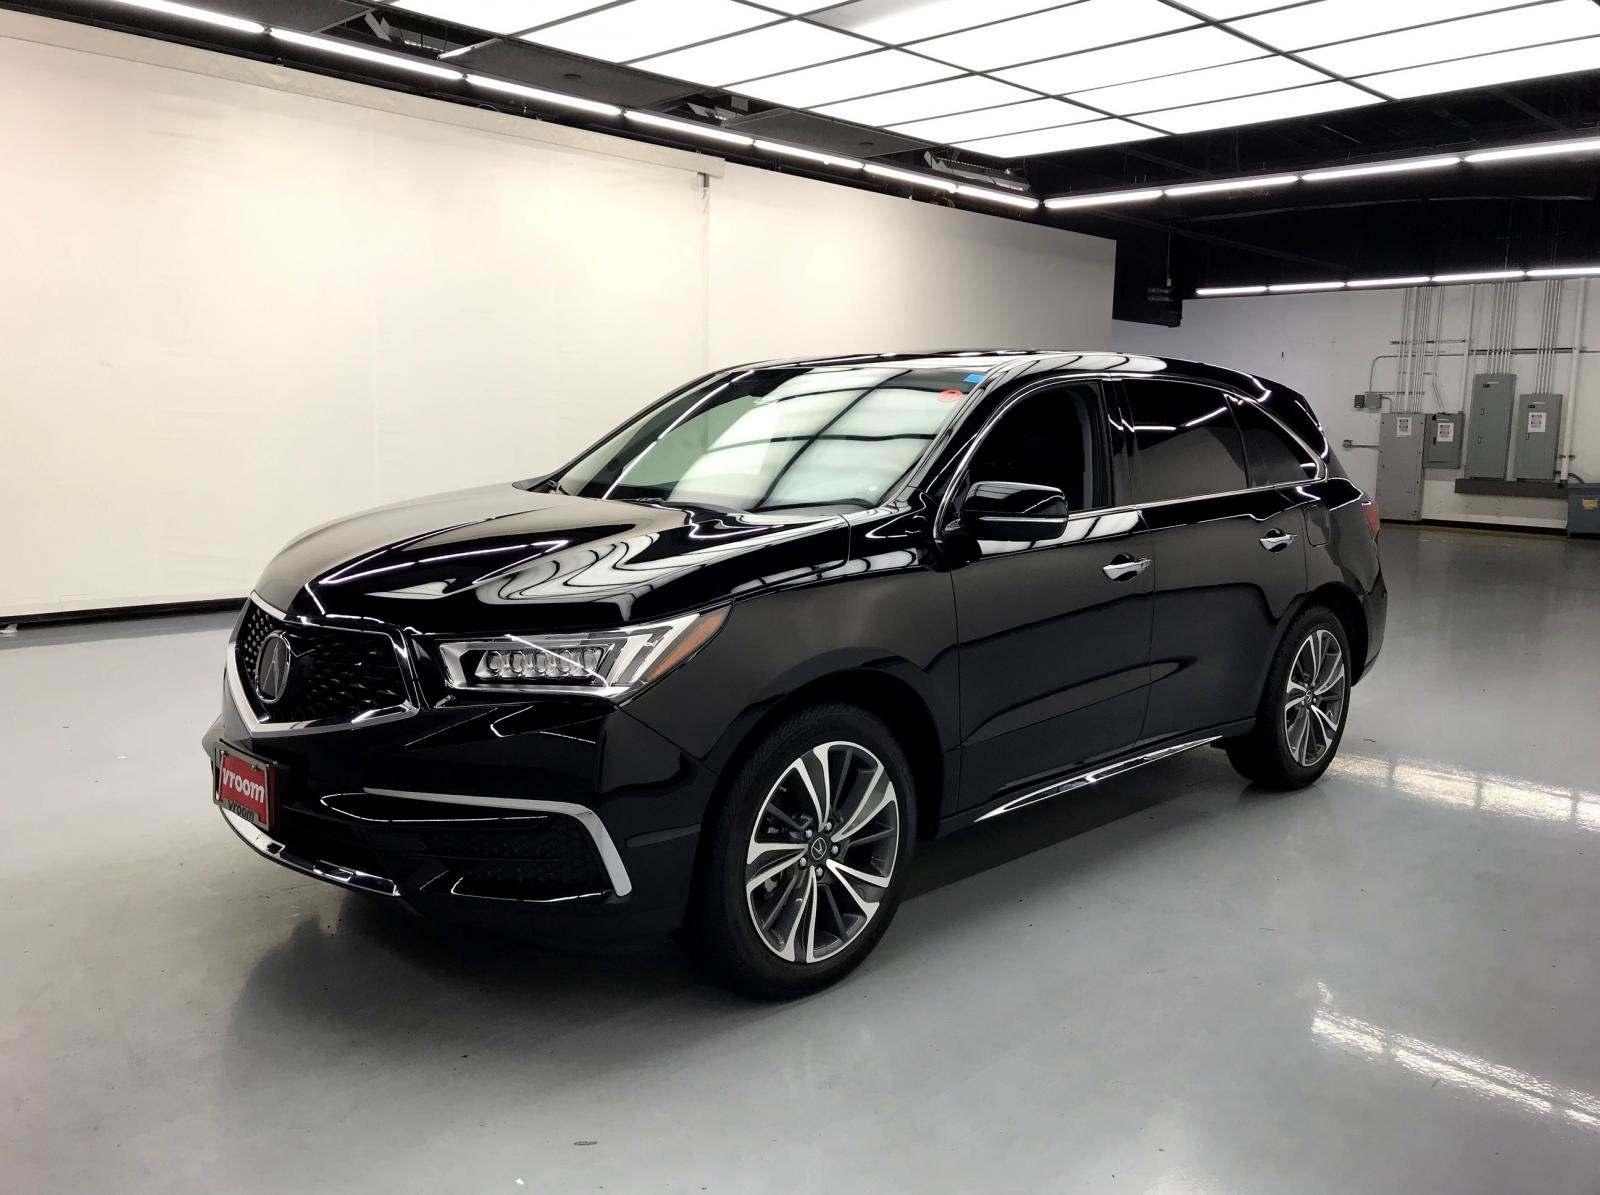 used Acura MDX 2019 vin: 5J8YD4H54KL026568